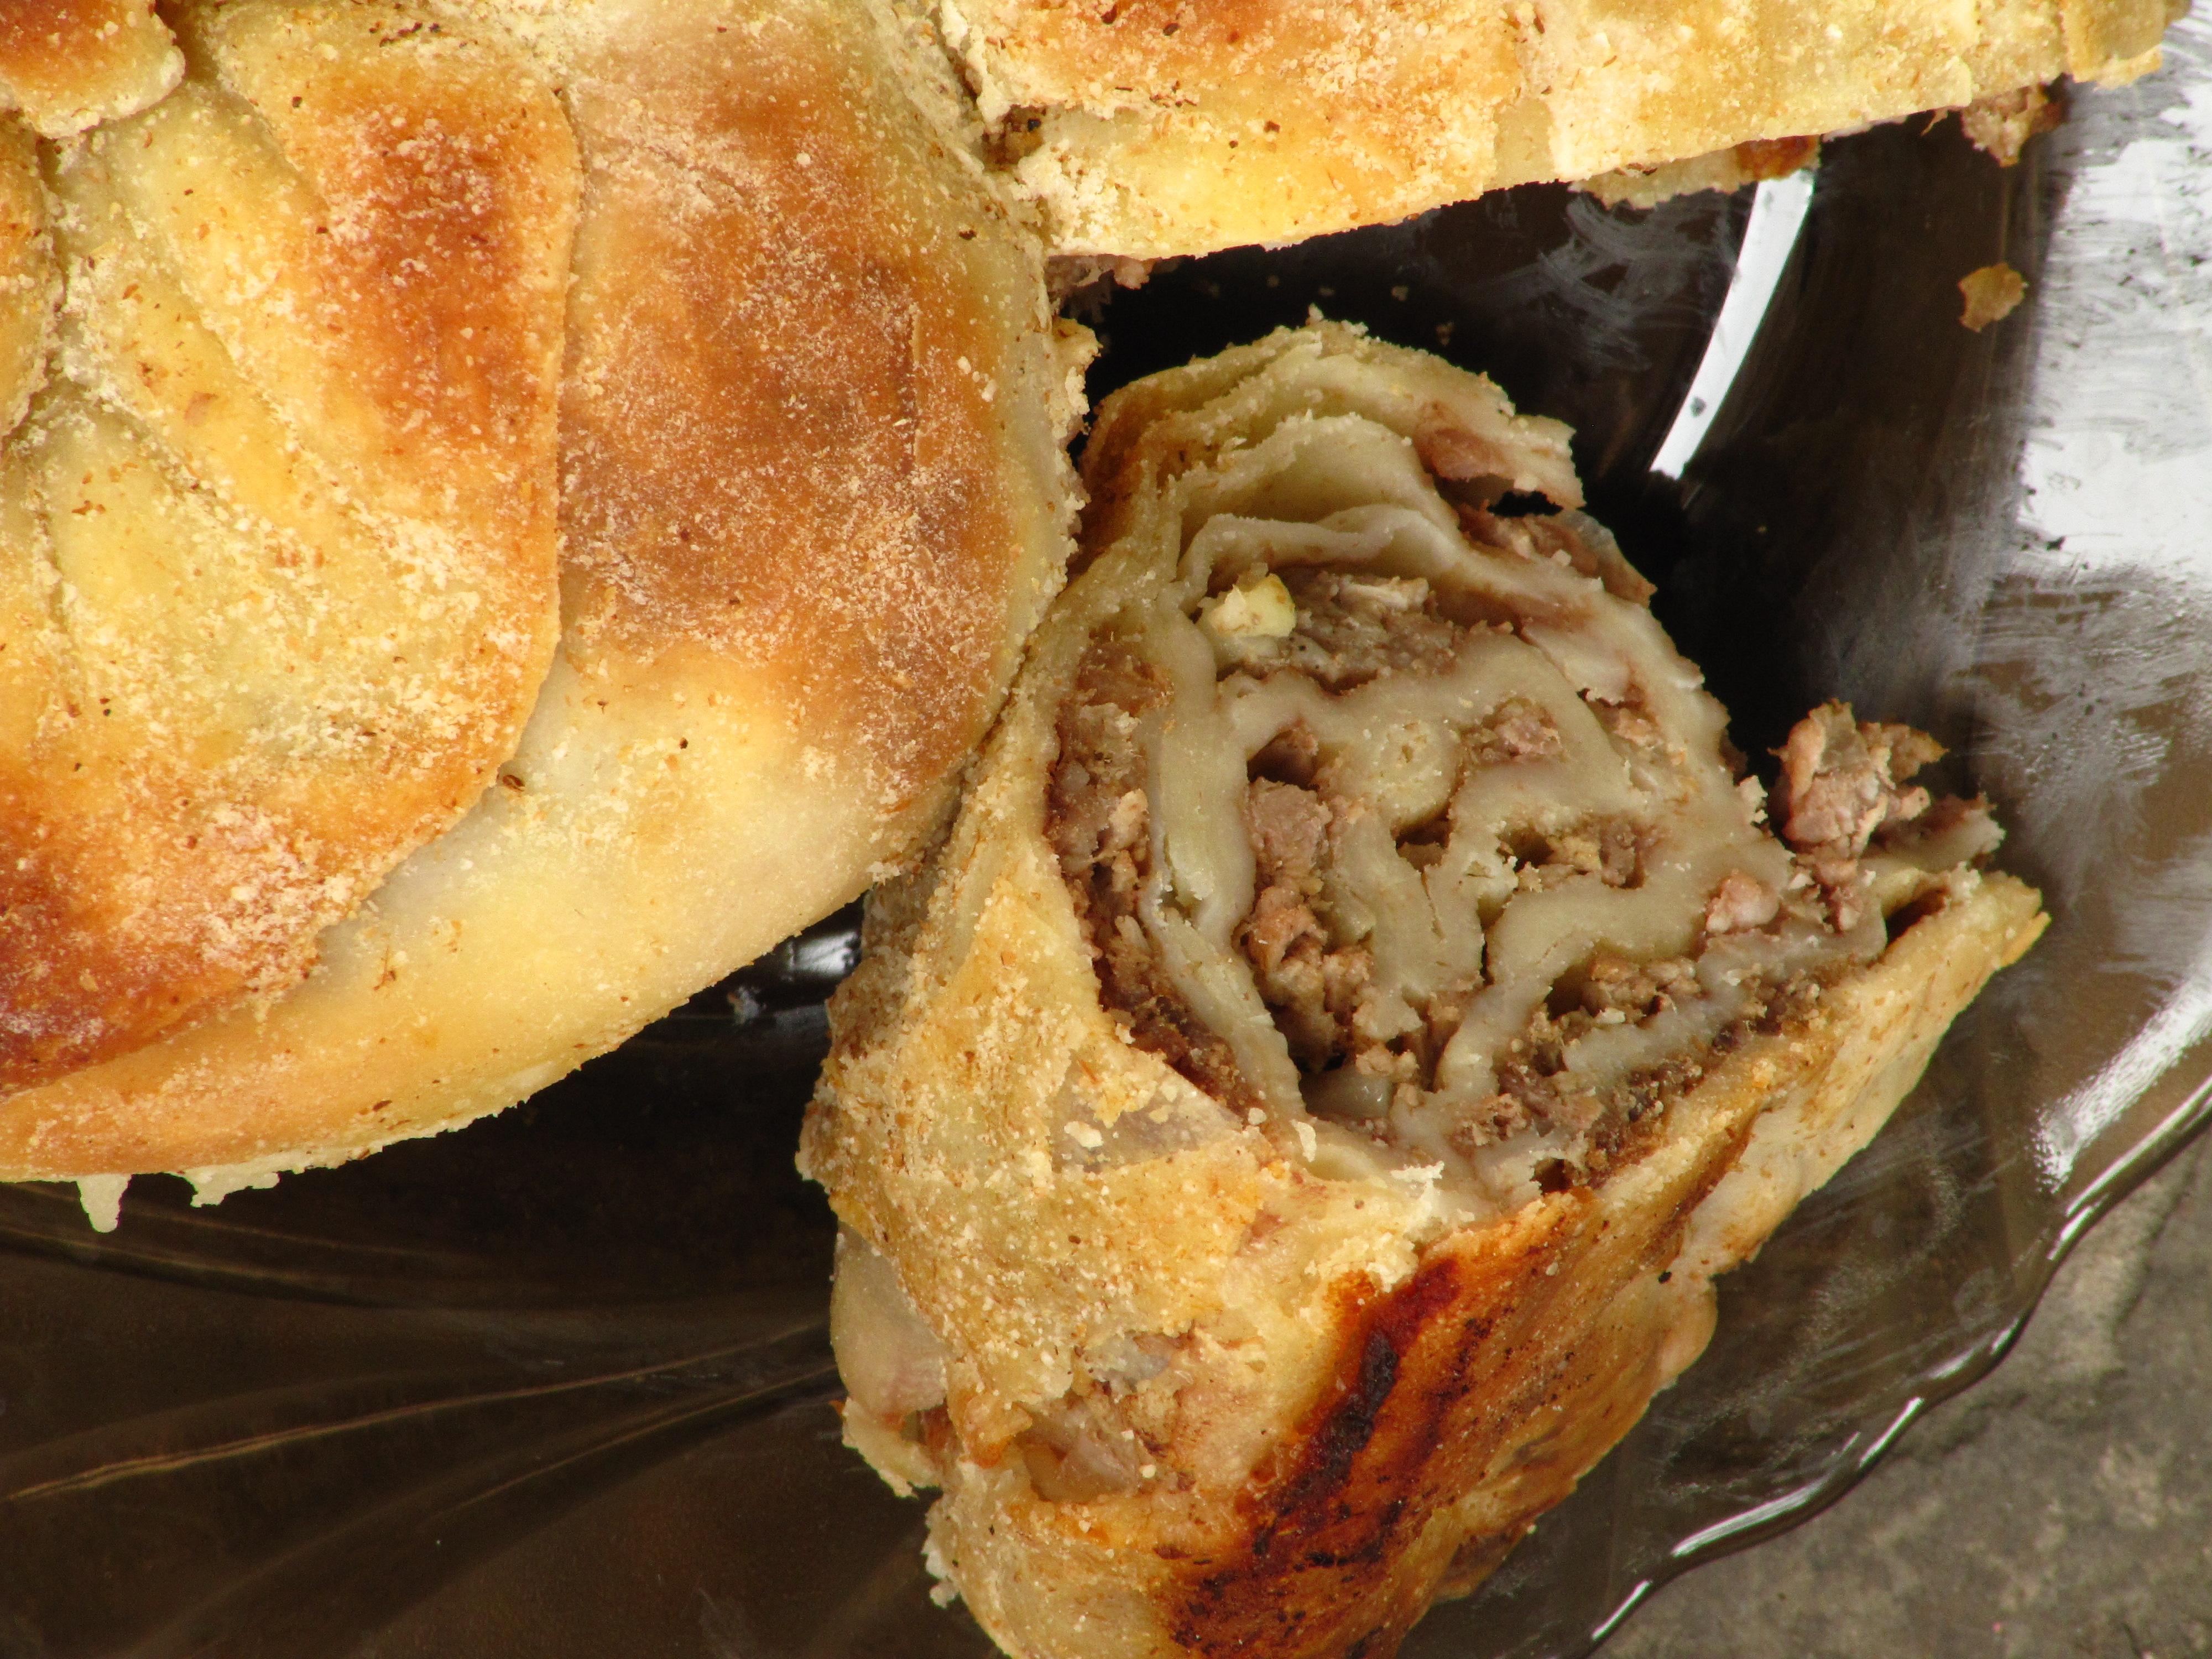 Pie Baked Inside A Cake Recipe